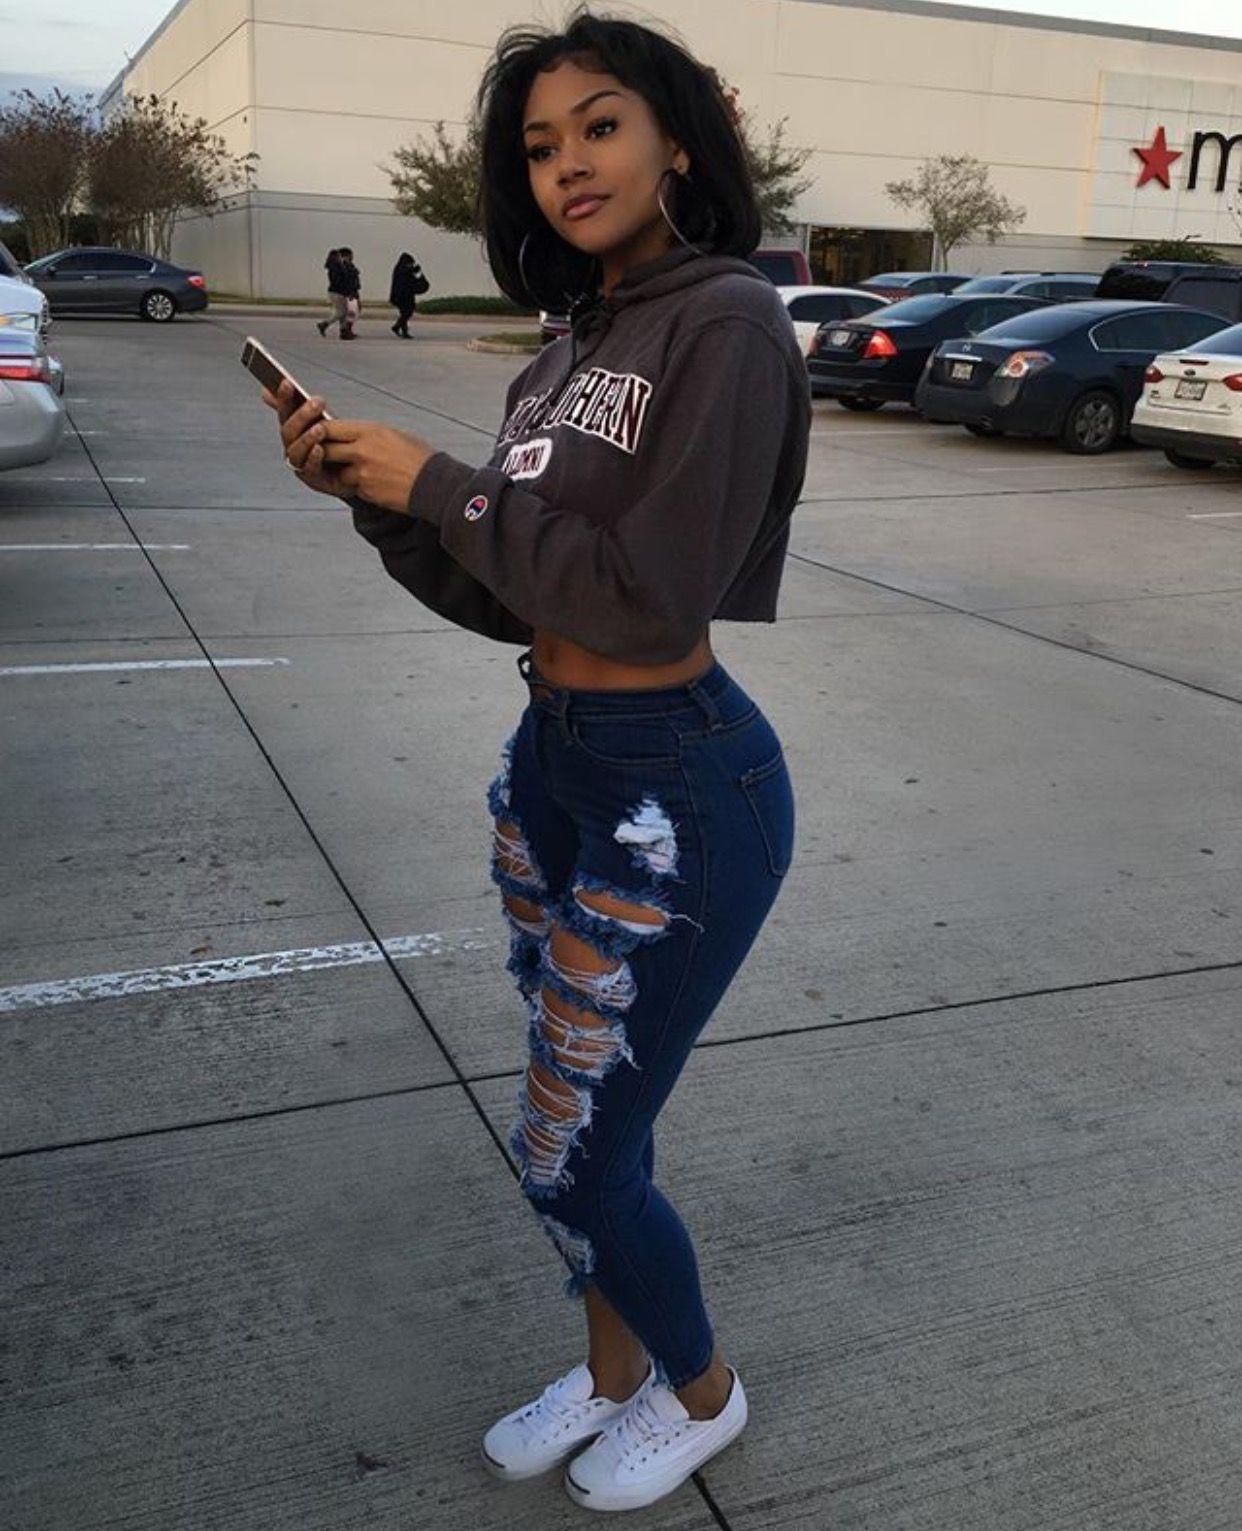 Pin by Ceola Cook on Black Girls | Pinterest | Fashion killa Black girls and Pretty girls